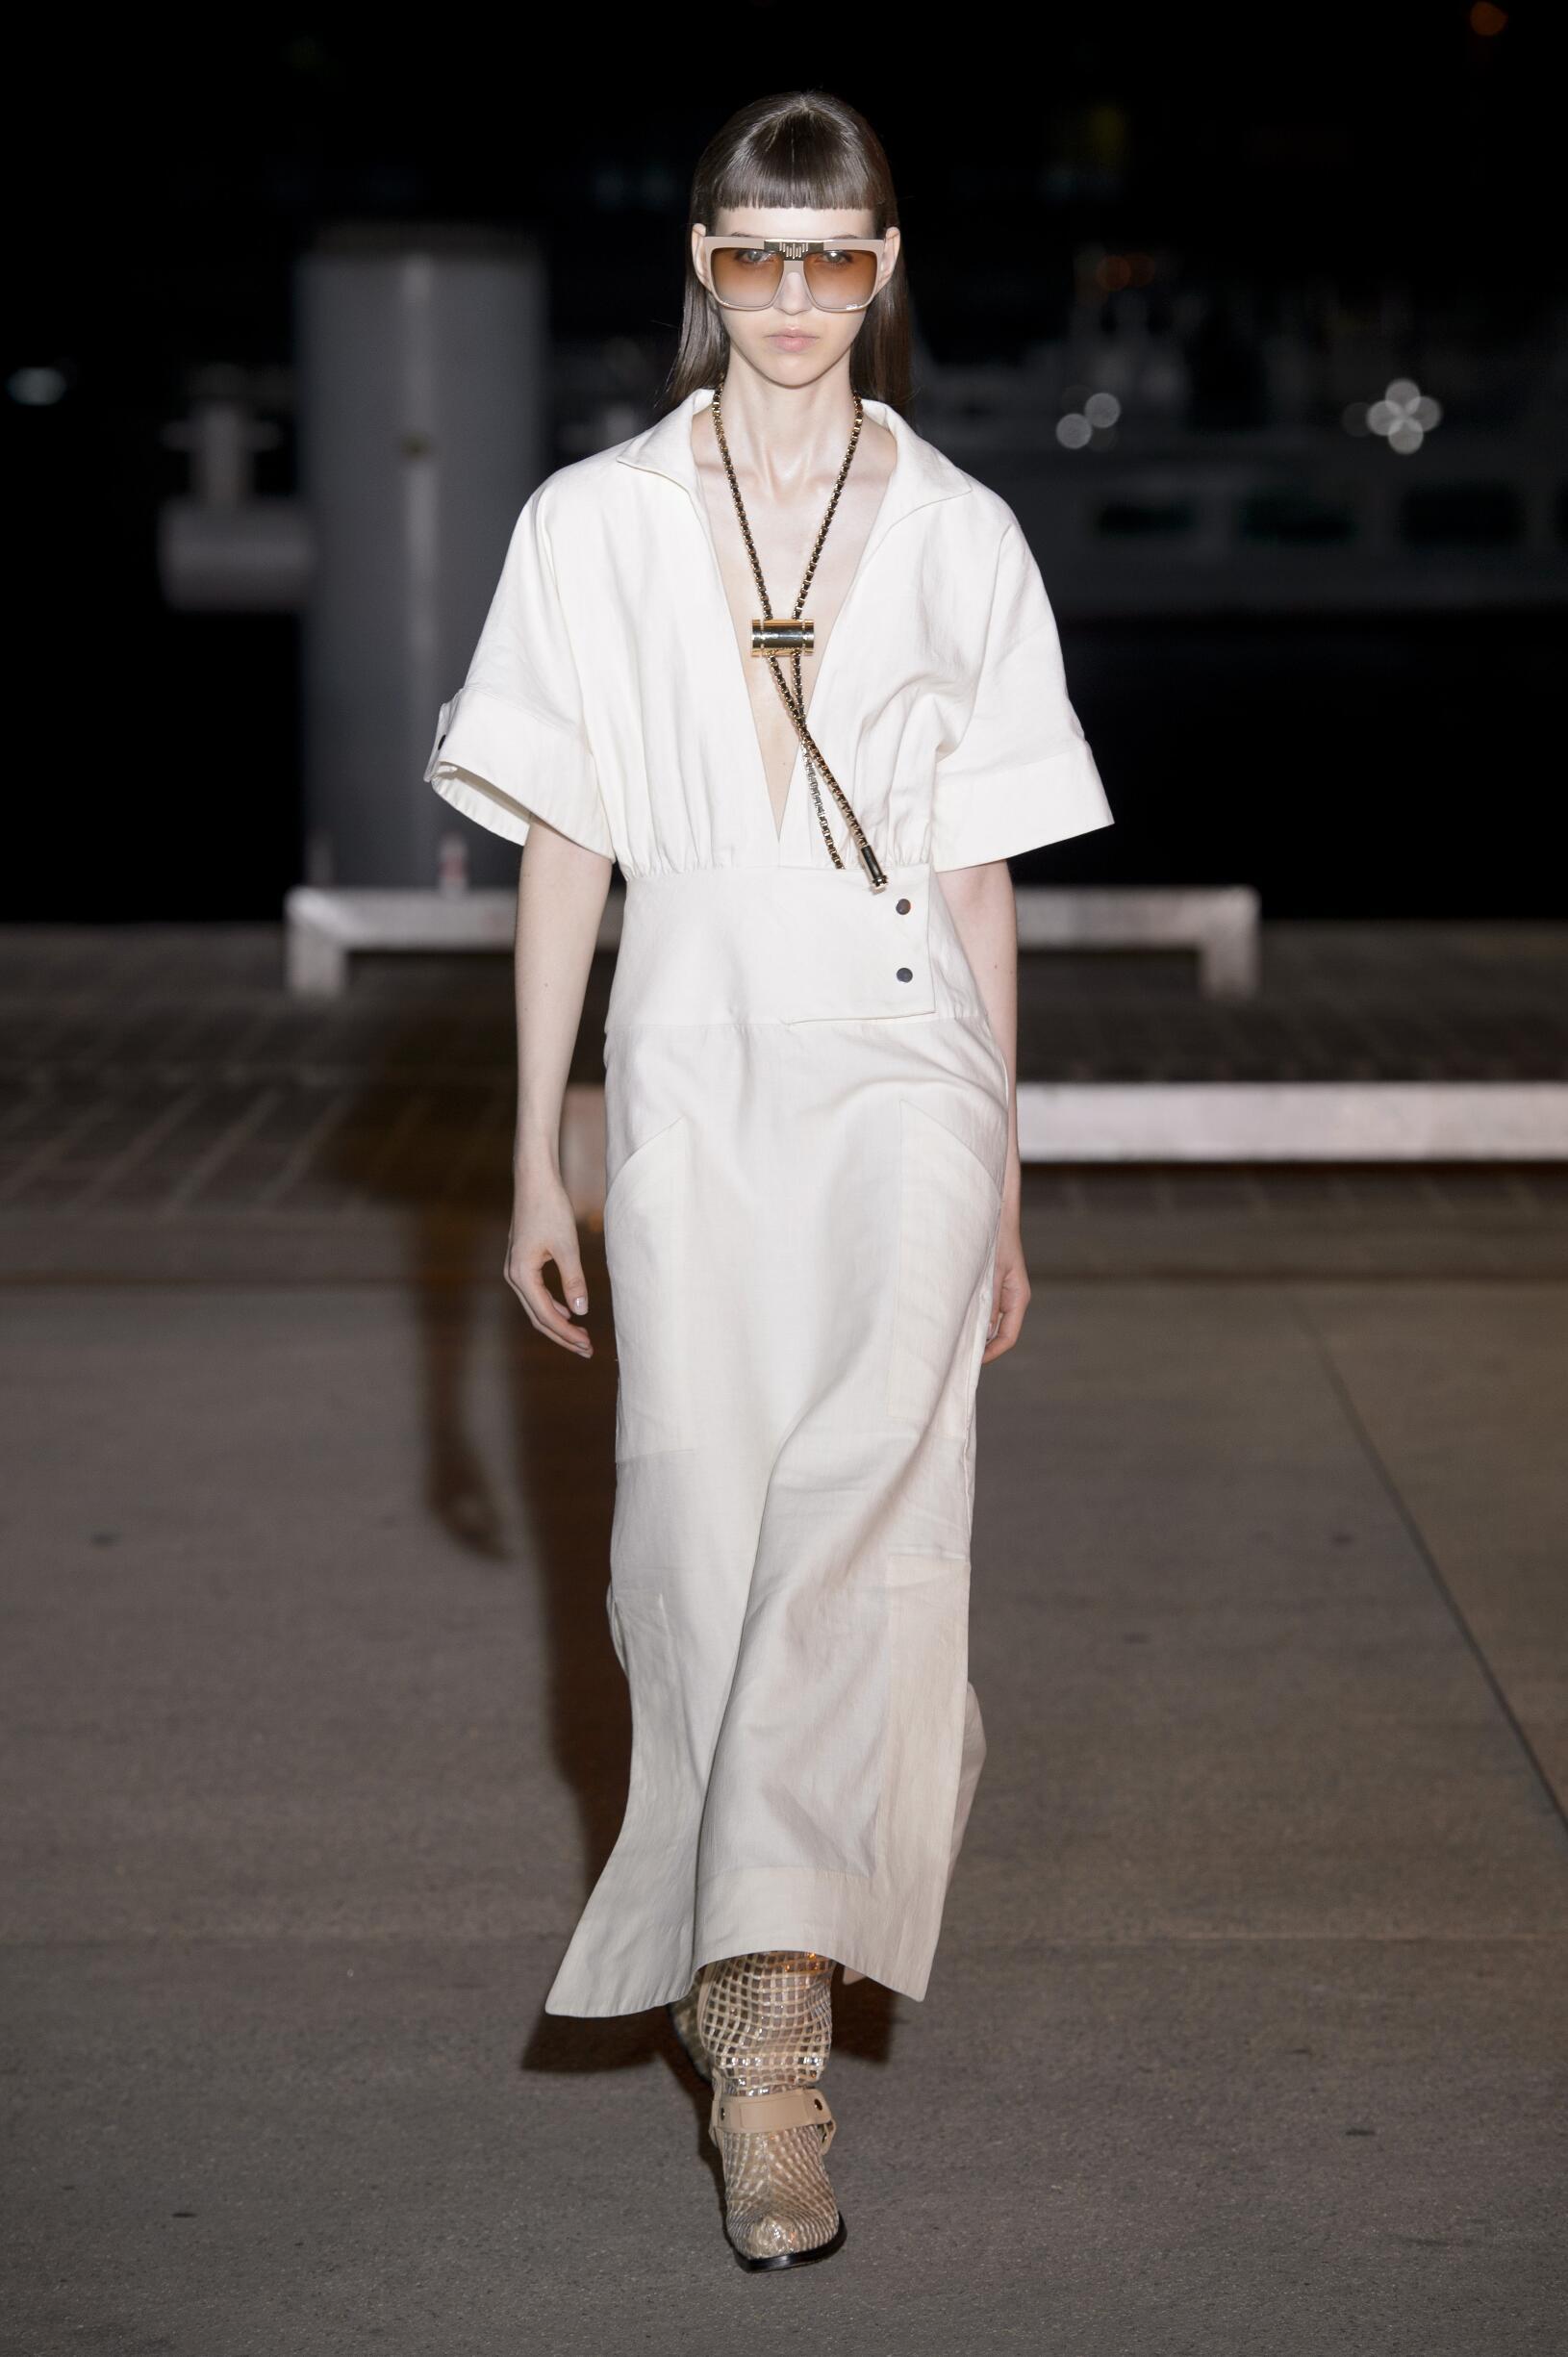 Runway Wanda Nylon Spring Summer 2017 Women's Collection Paris Fashion Week